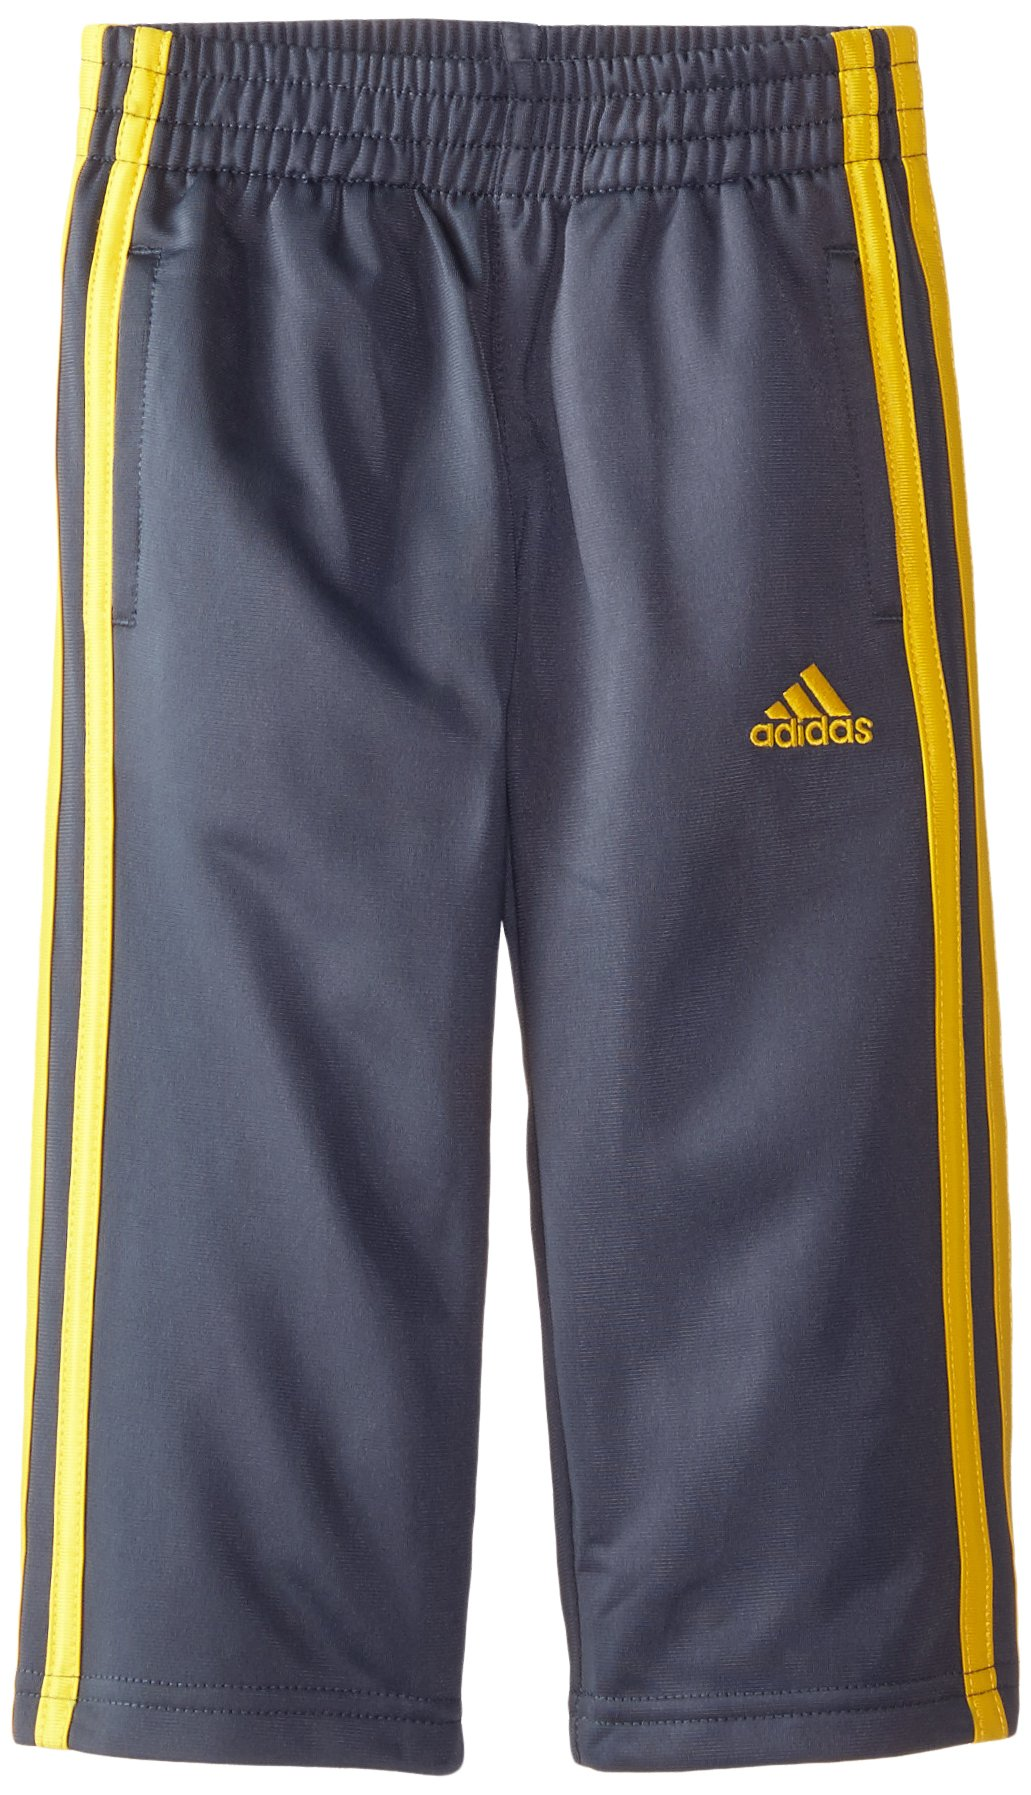 adidas Little Boys' Tricot Pant, Mercury Grey/Super Yellow/Heather, 5